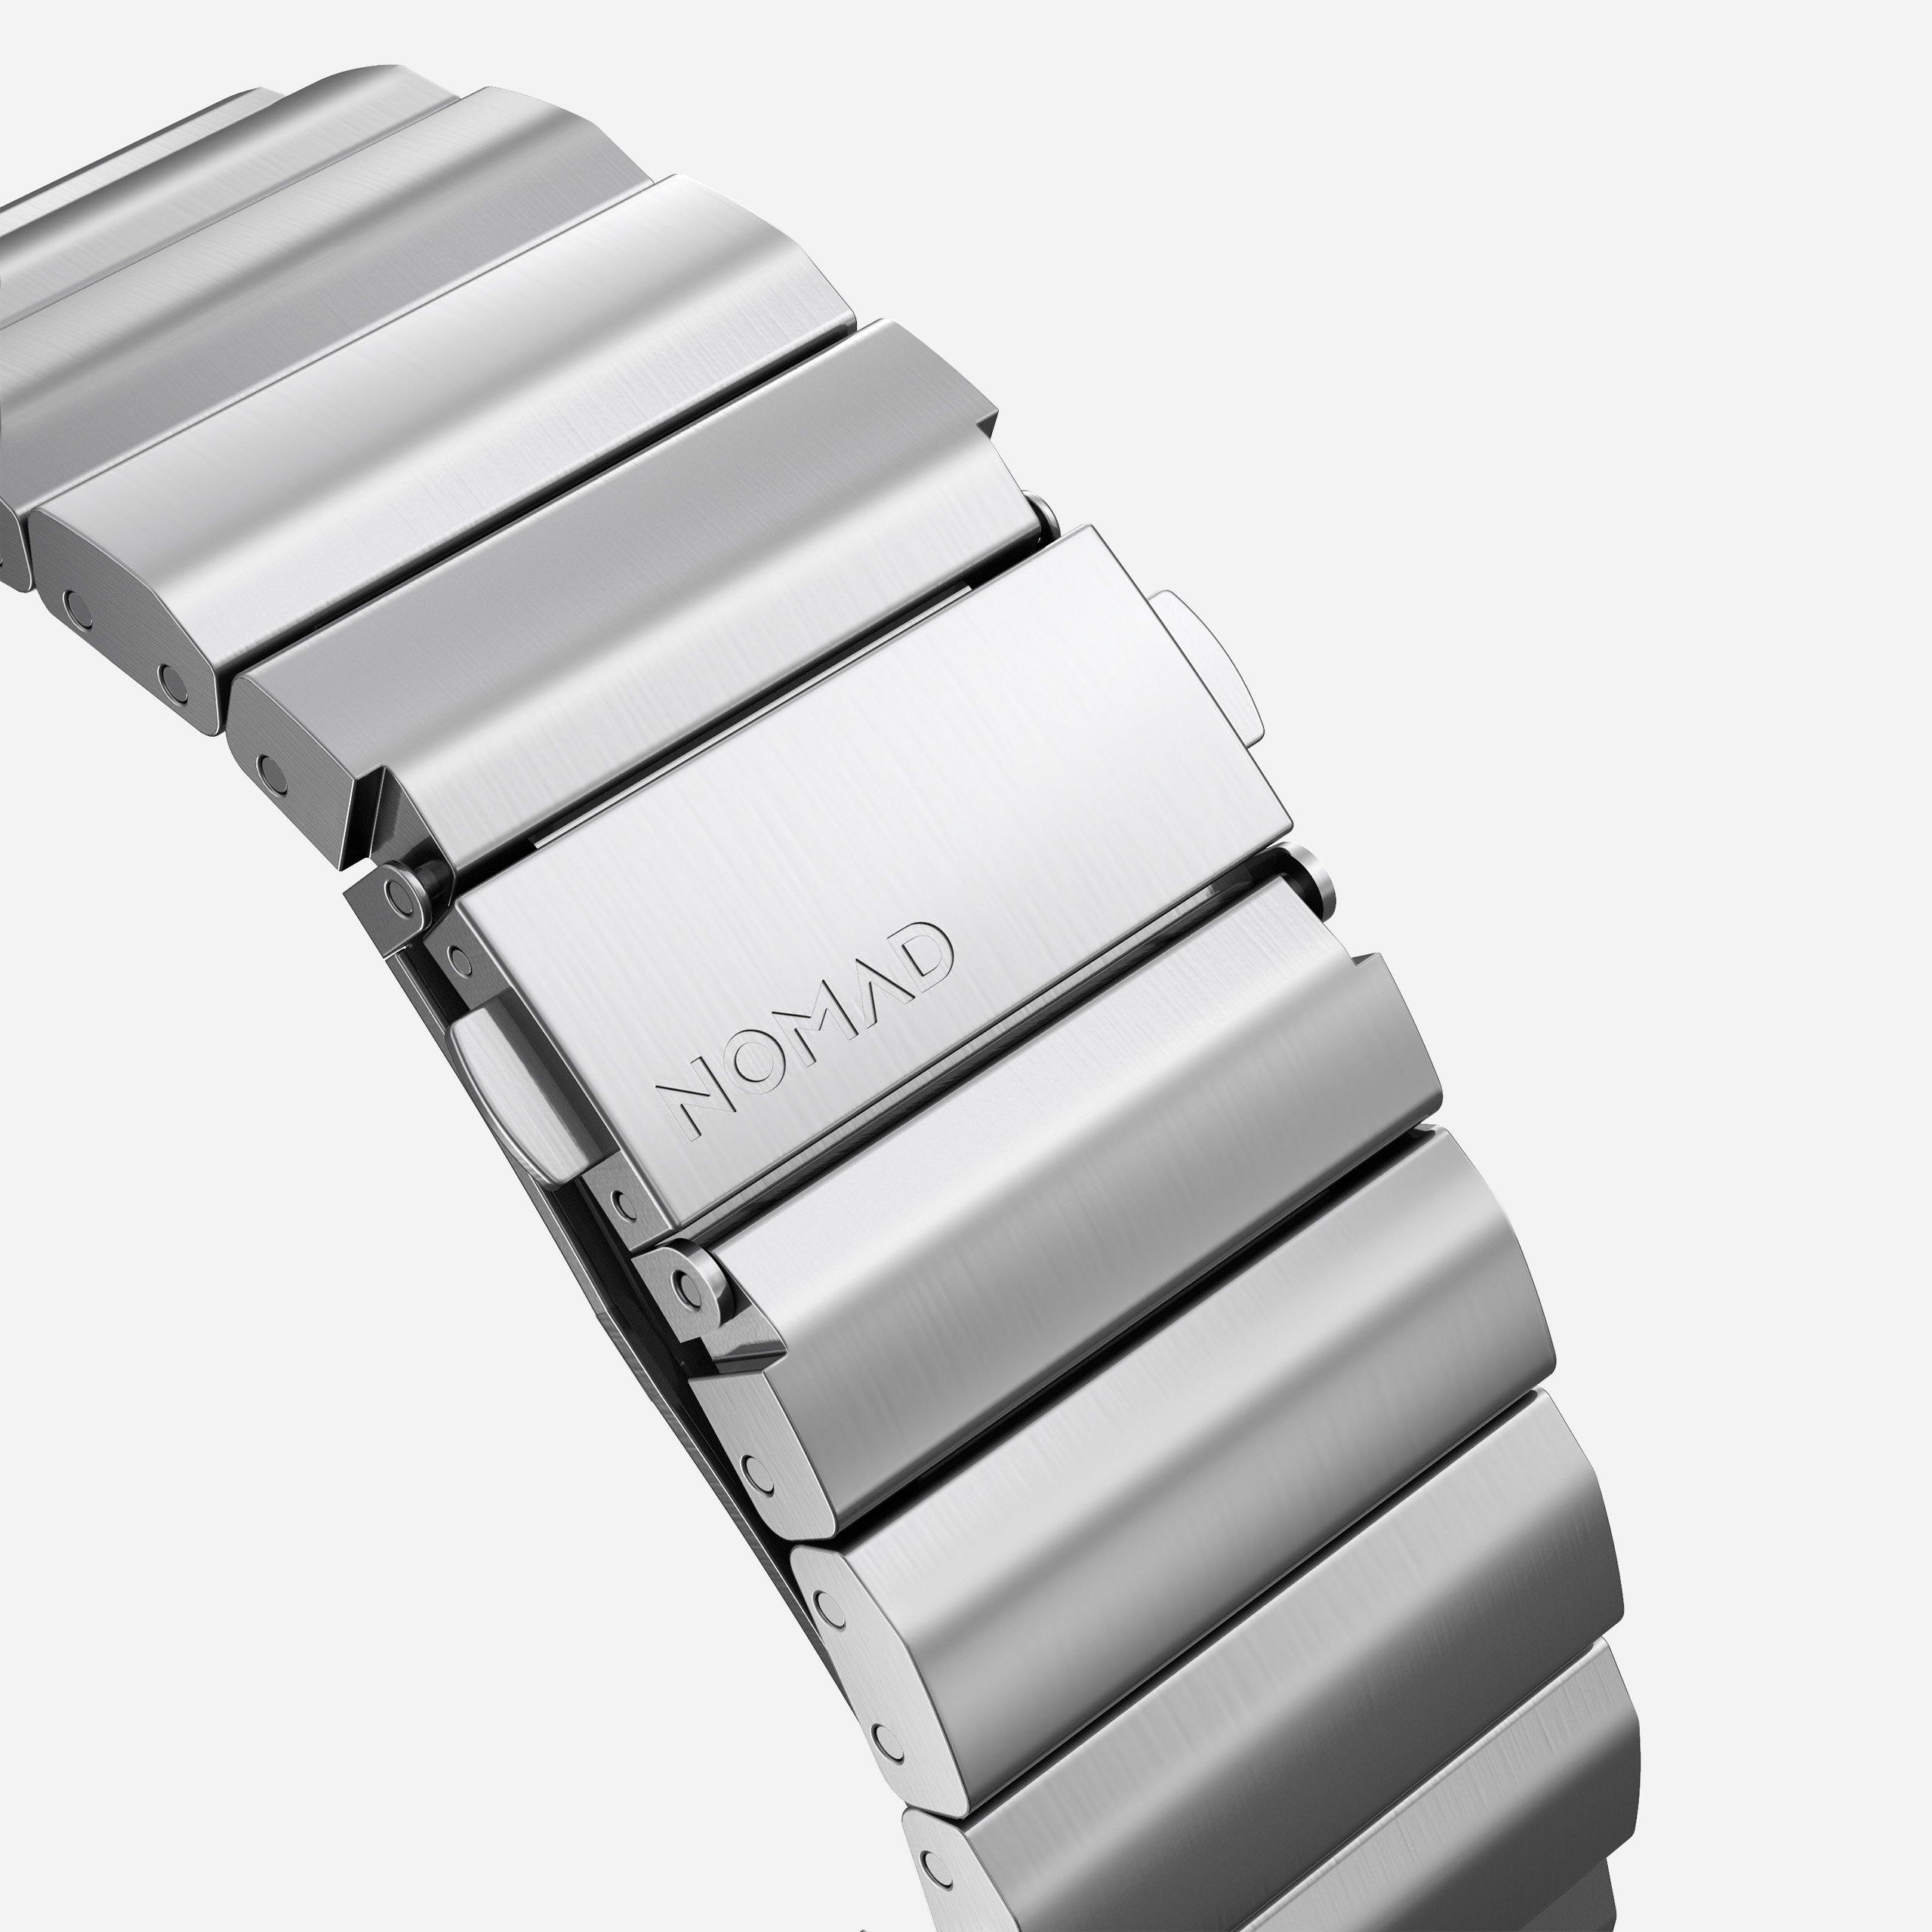 Titanium band silver hardware